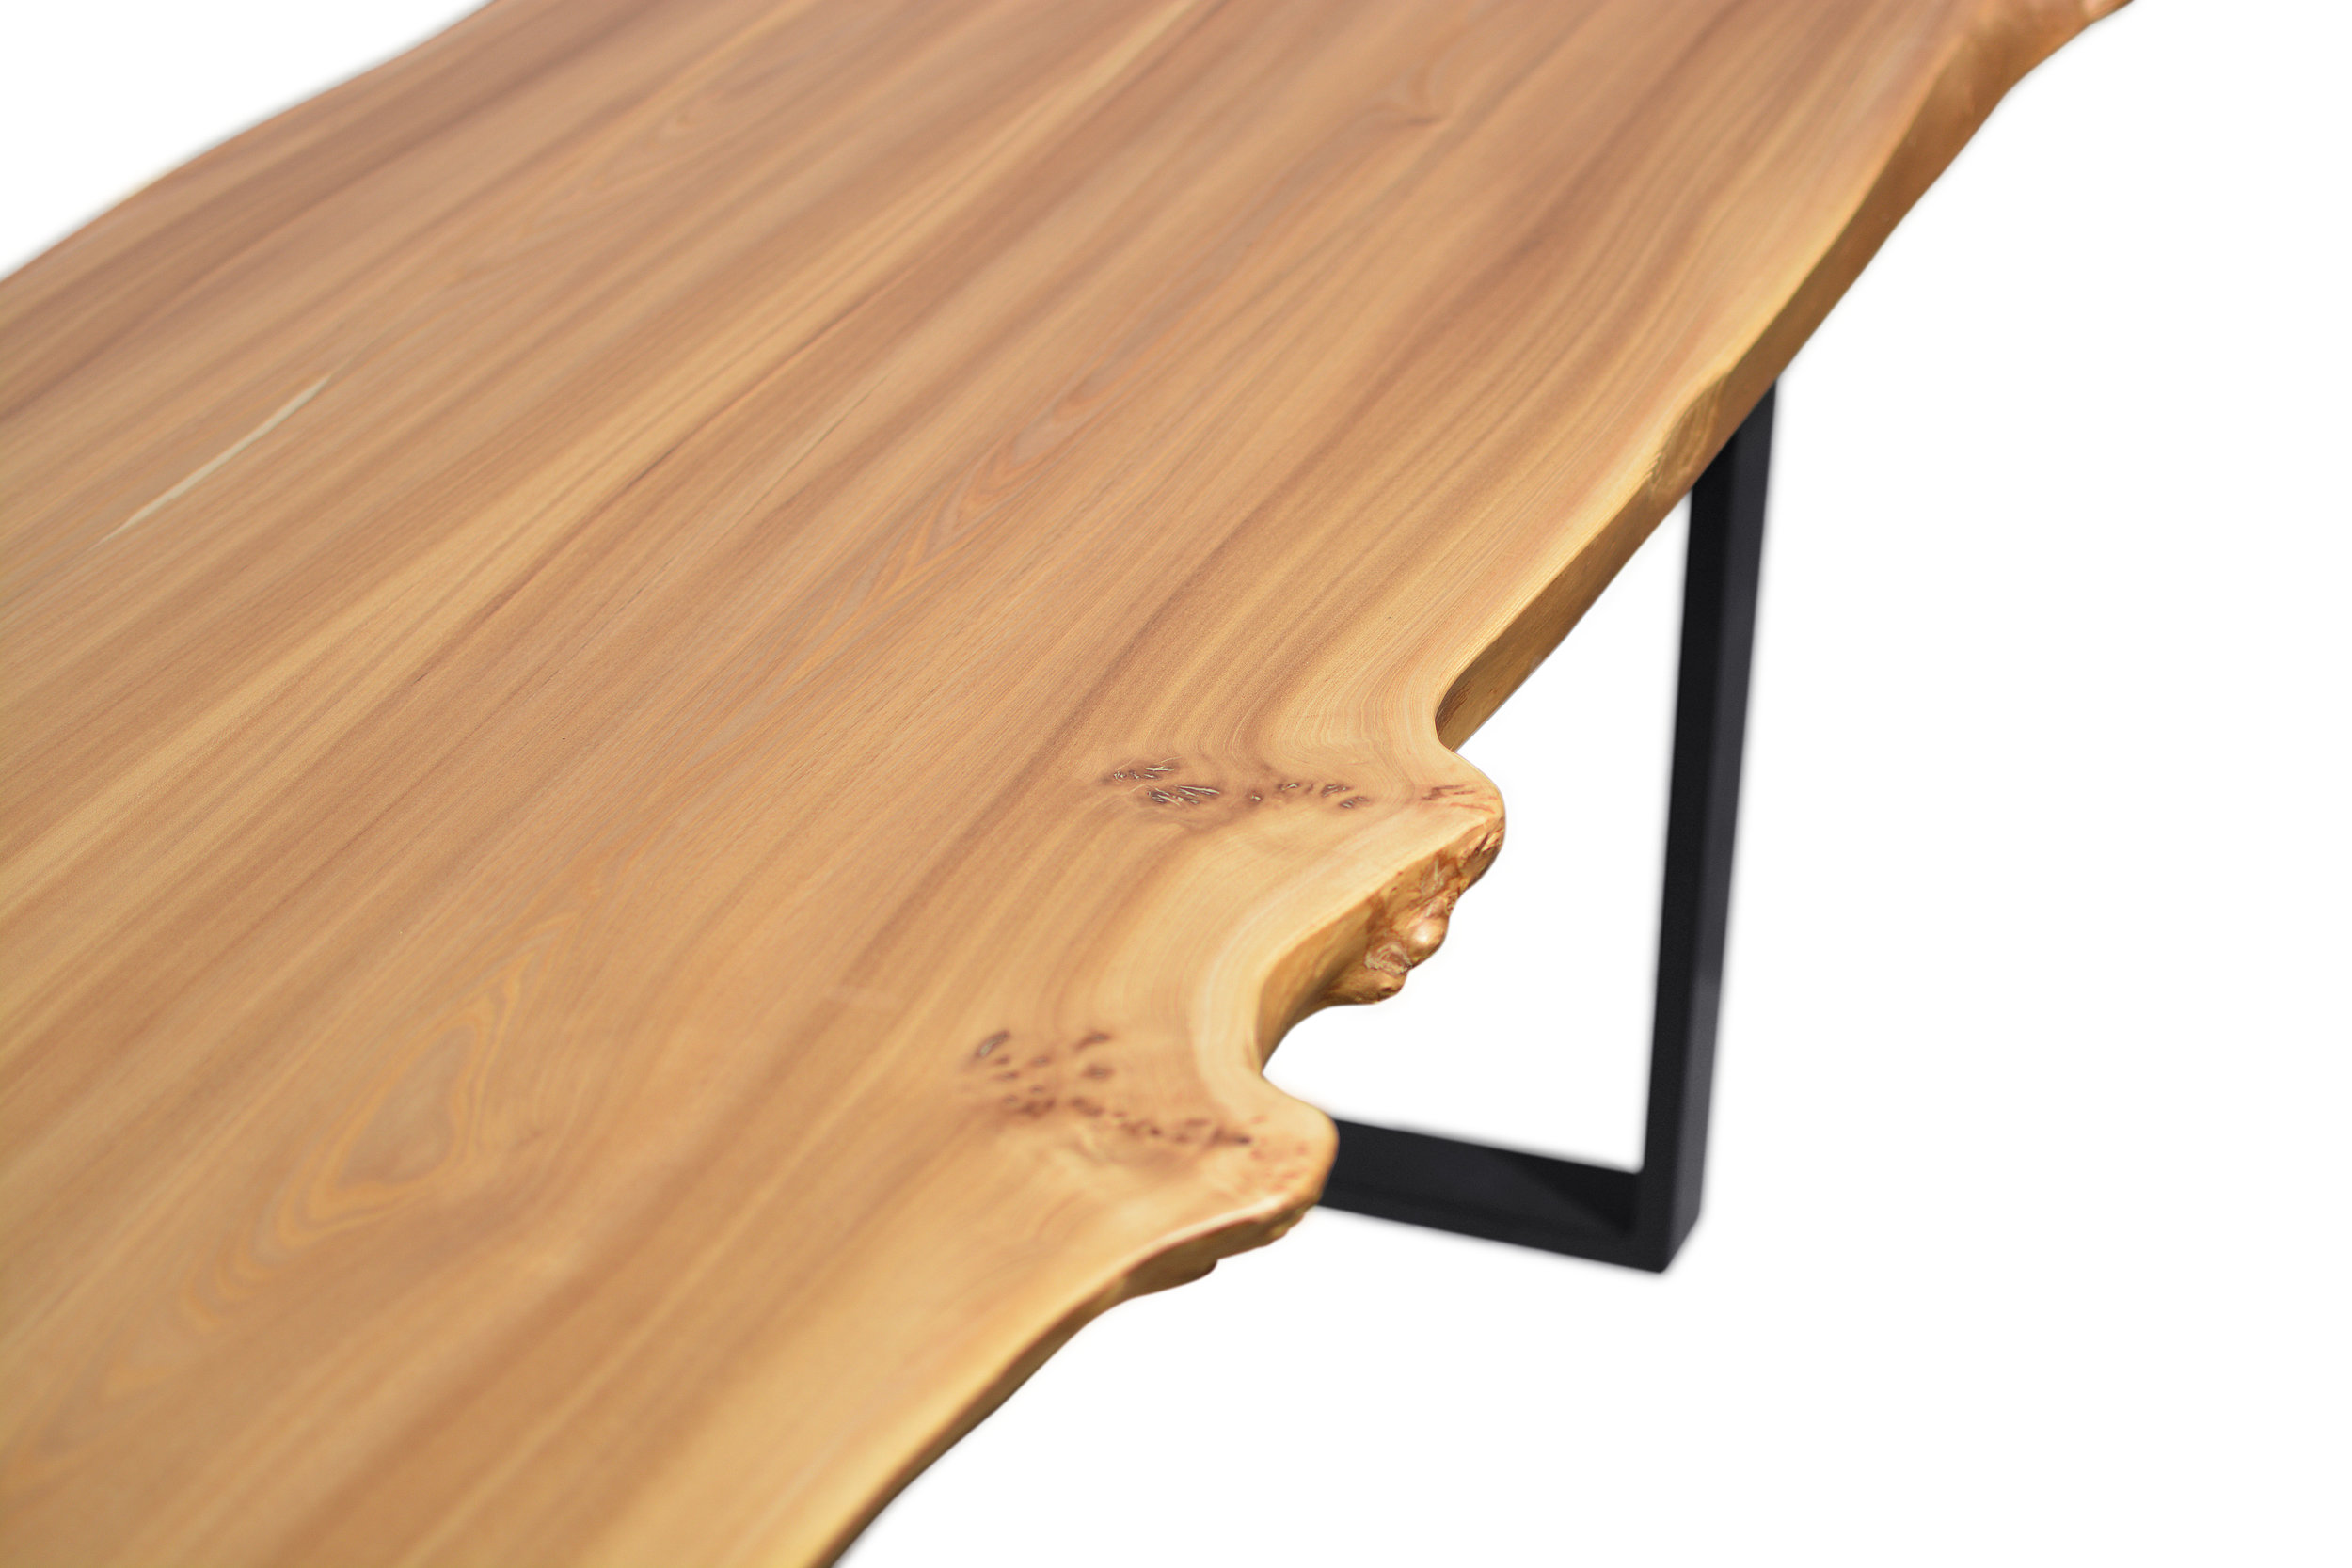 Etz & Steel Wave Live Edge Table Close Up 18.JPG